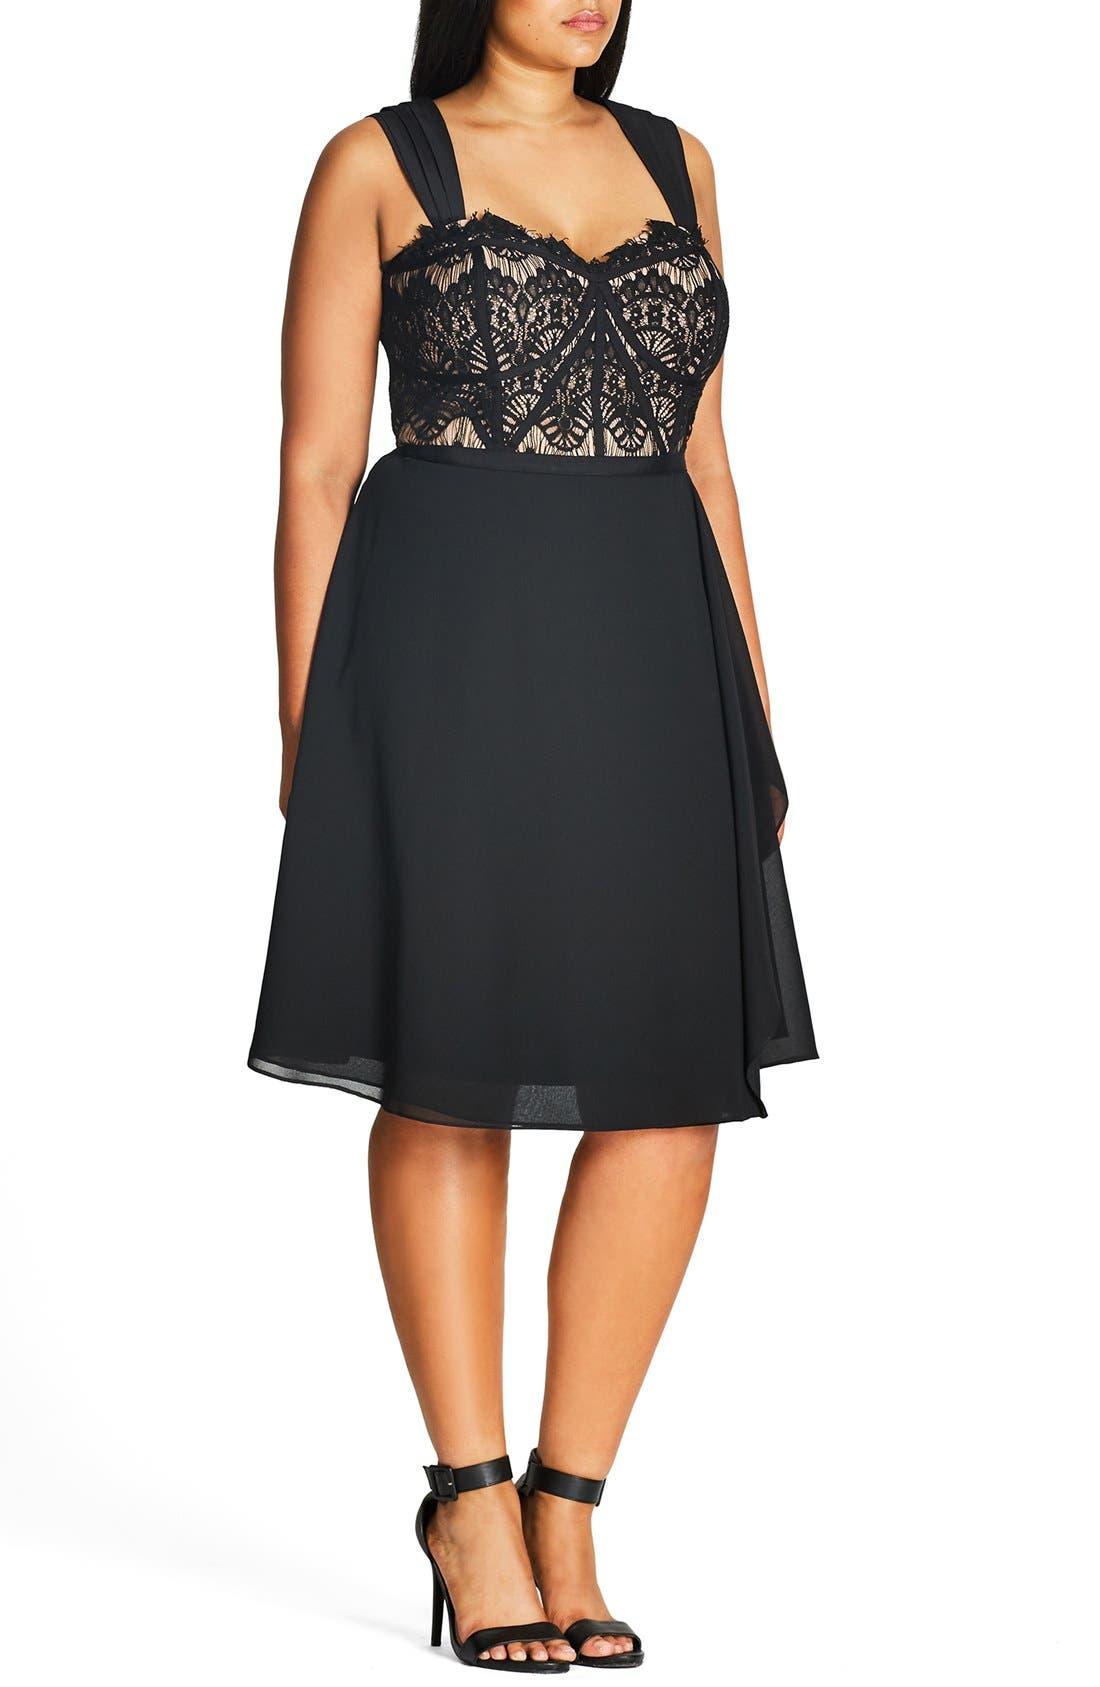 CITY CHIC, 'Eyelash Evie' Lace & Chiffon Cocktail Dress, Alternate thumbnail 4, color, BLACK